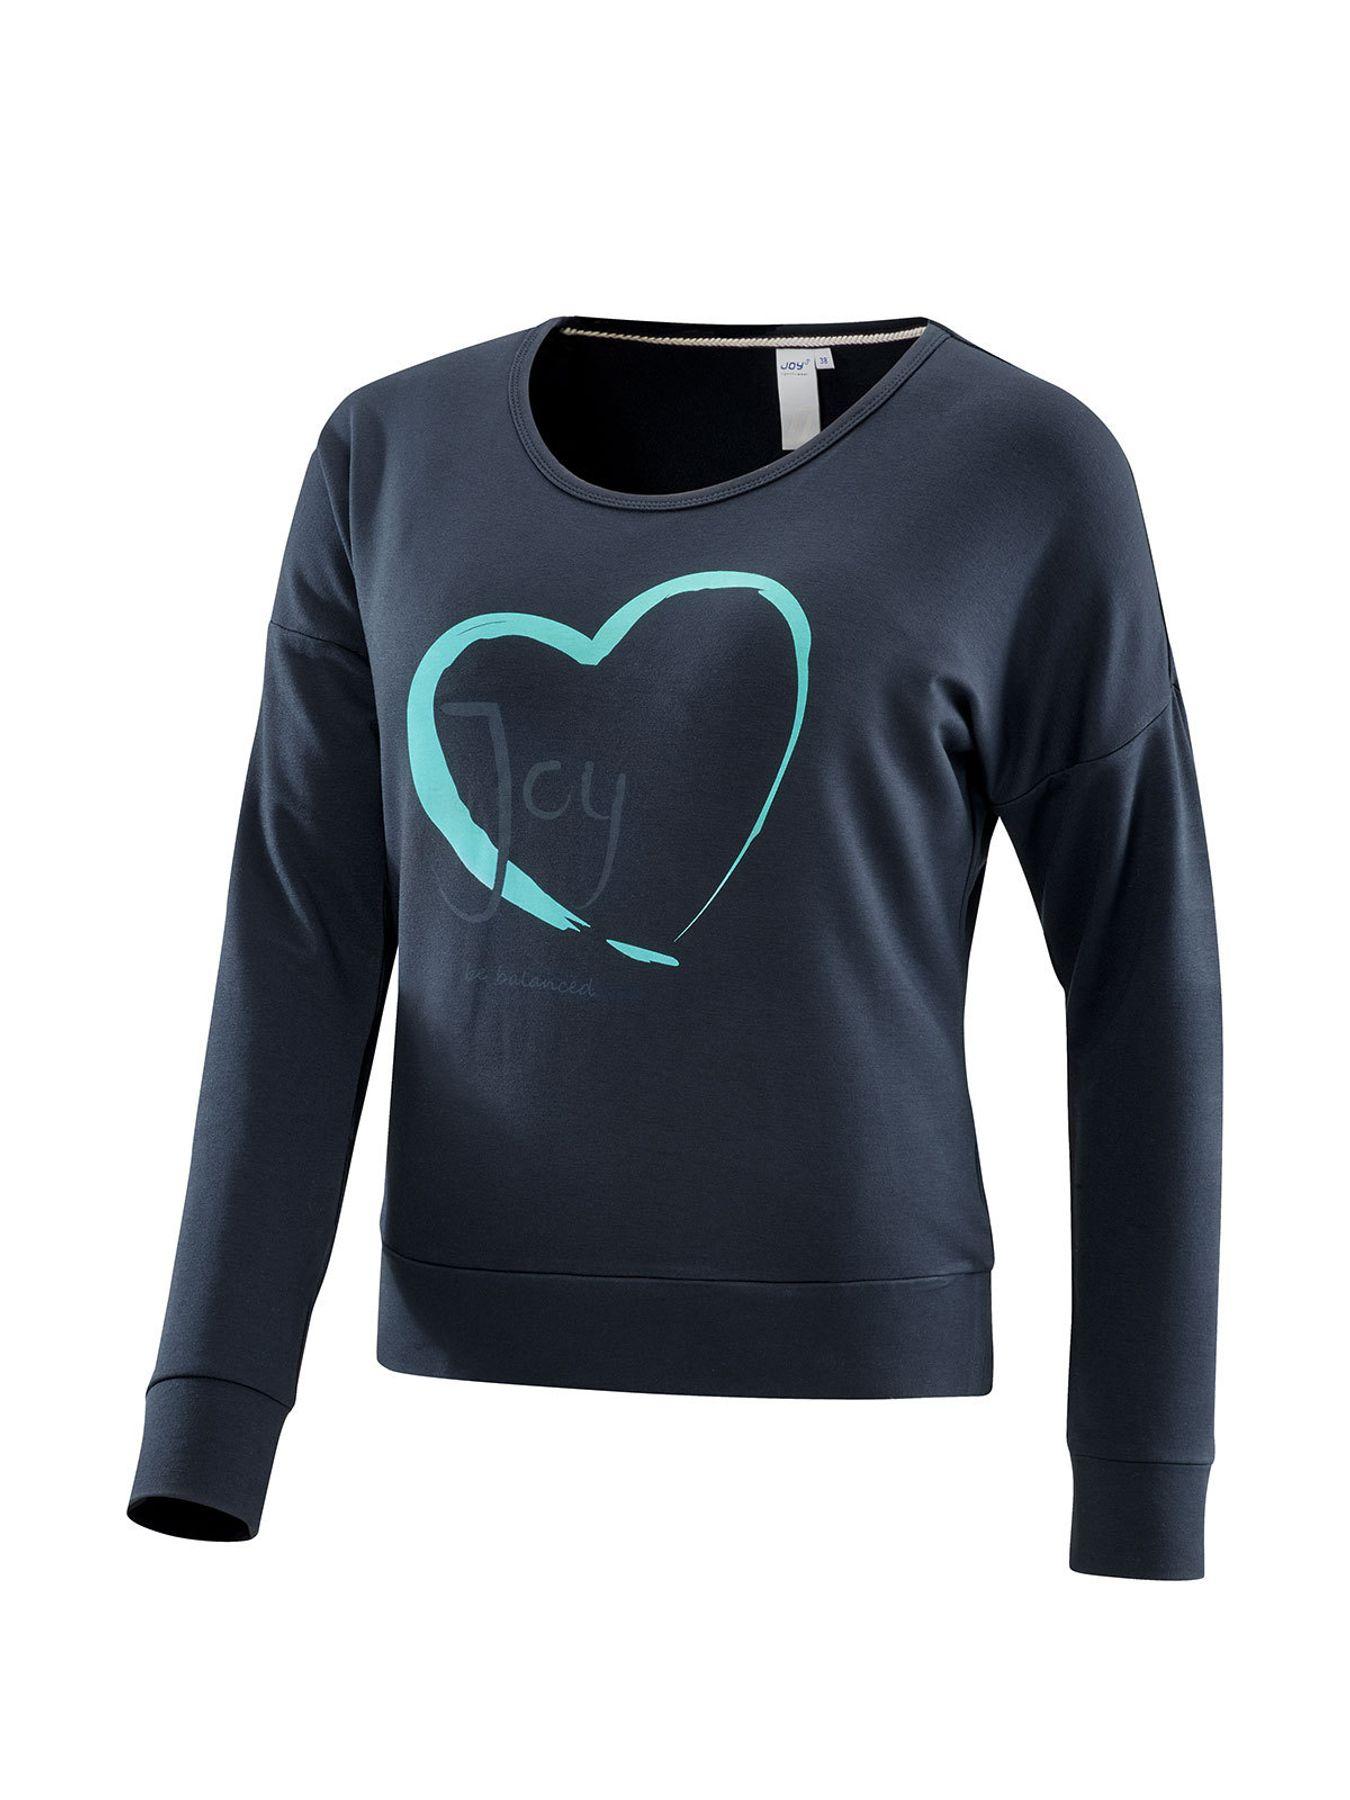 Joy - Damen Langarmshirt in Night blue, Zenia (34485 A) – Bild 1